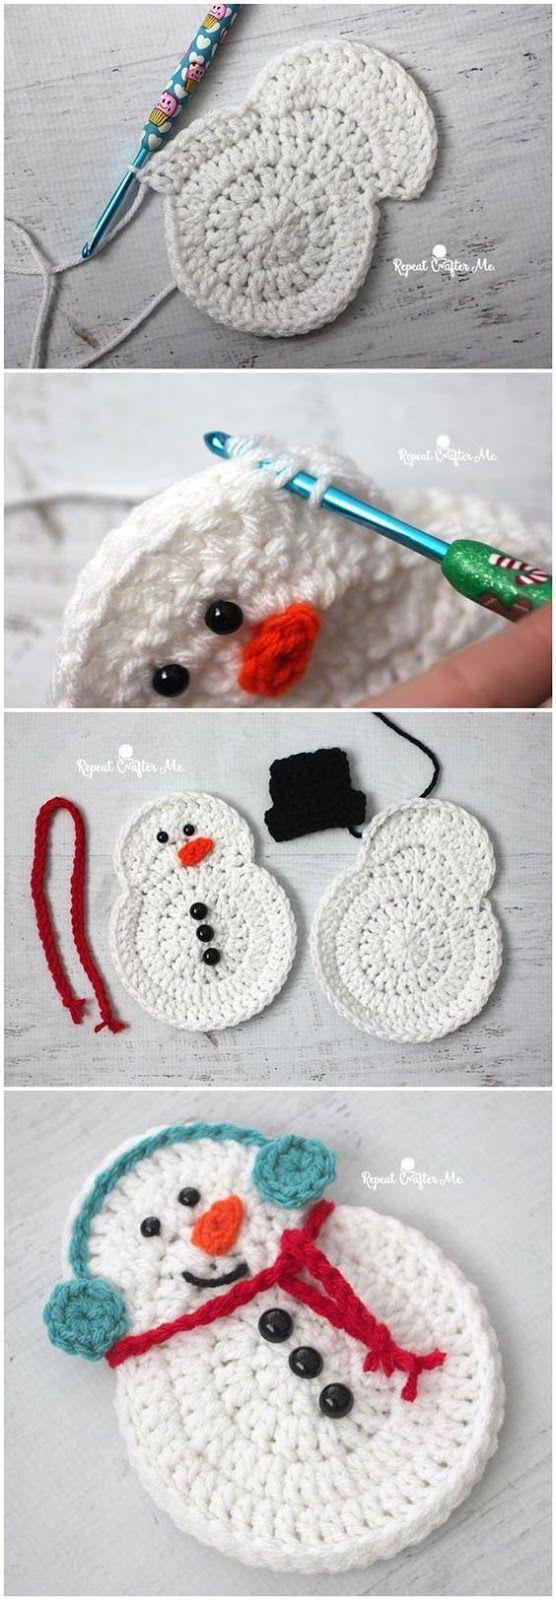 Luty Artes Crochet | Ganchillo | Pinterest | Arte, Apliques y Natal